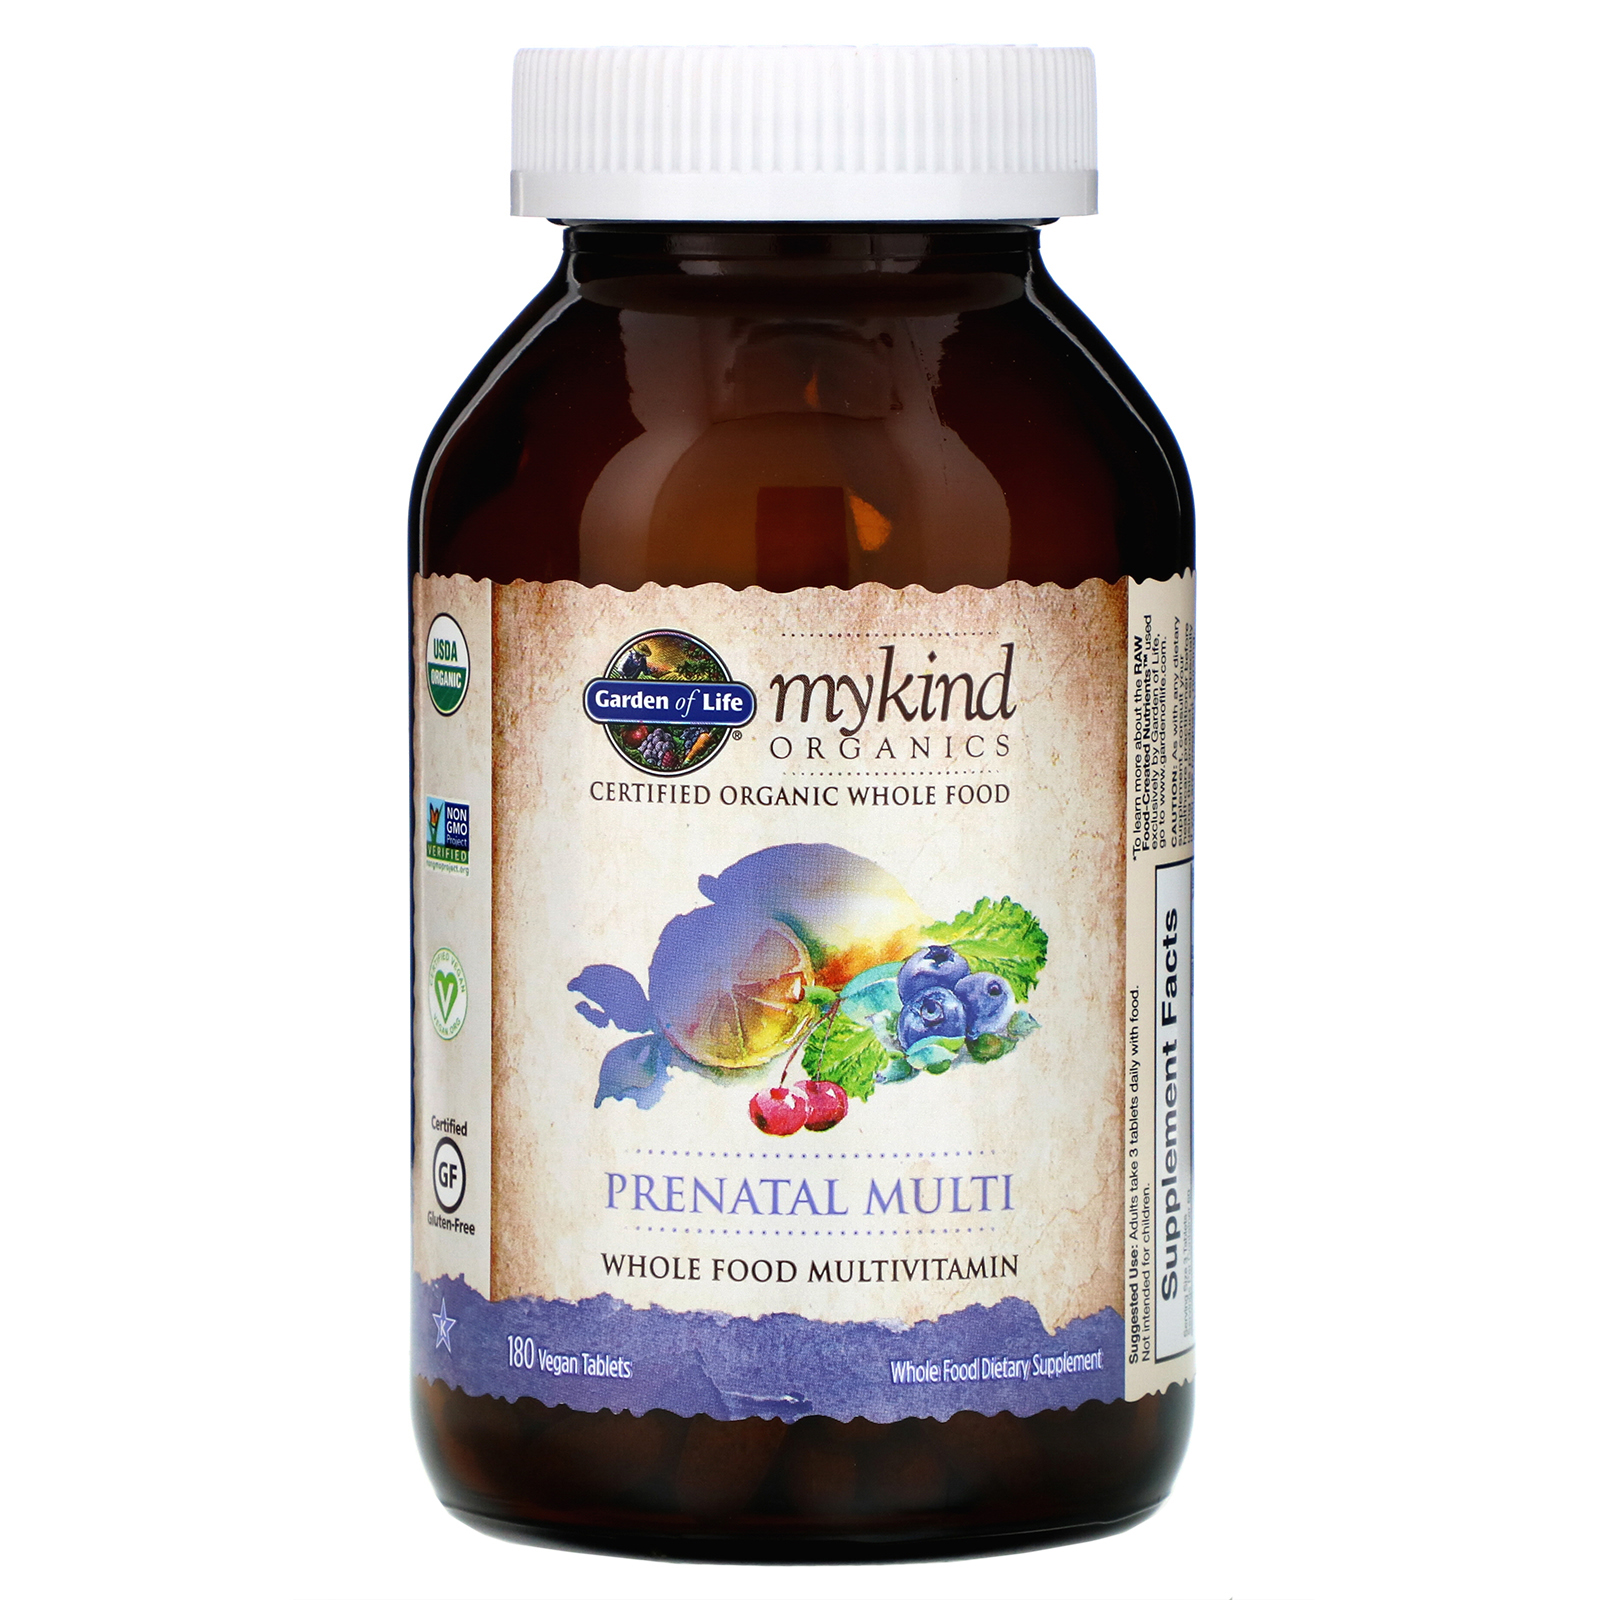 Garden Of Life Mykind Organics Prenatal Multi 180 Vegan Tablets Iherb